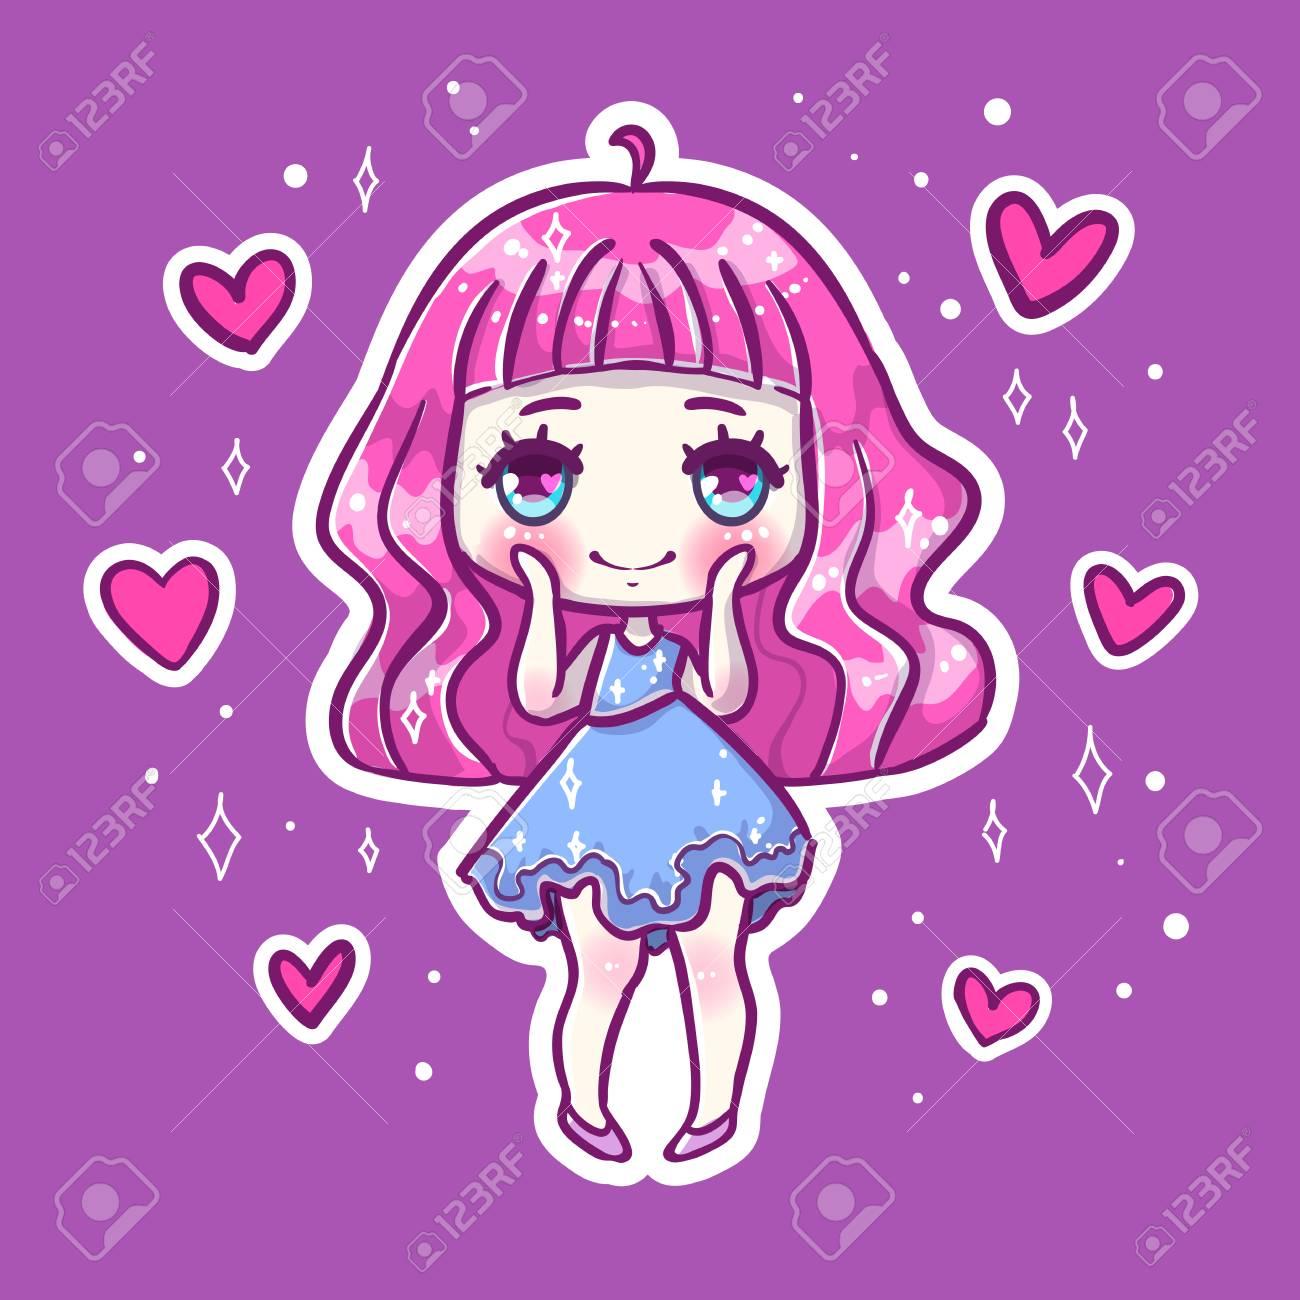 Cute Love Vector Illustration Kawaii Anime Girl Big Eyes Use